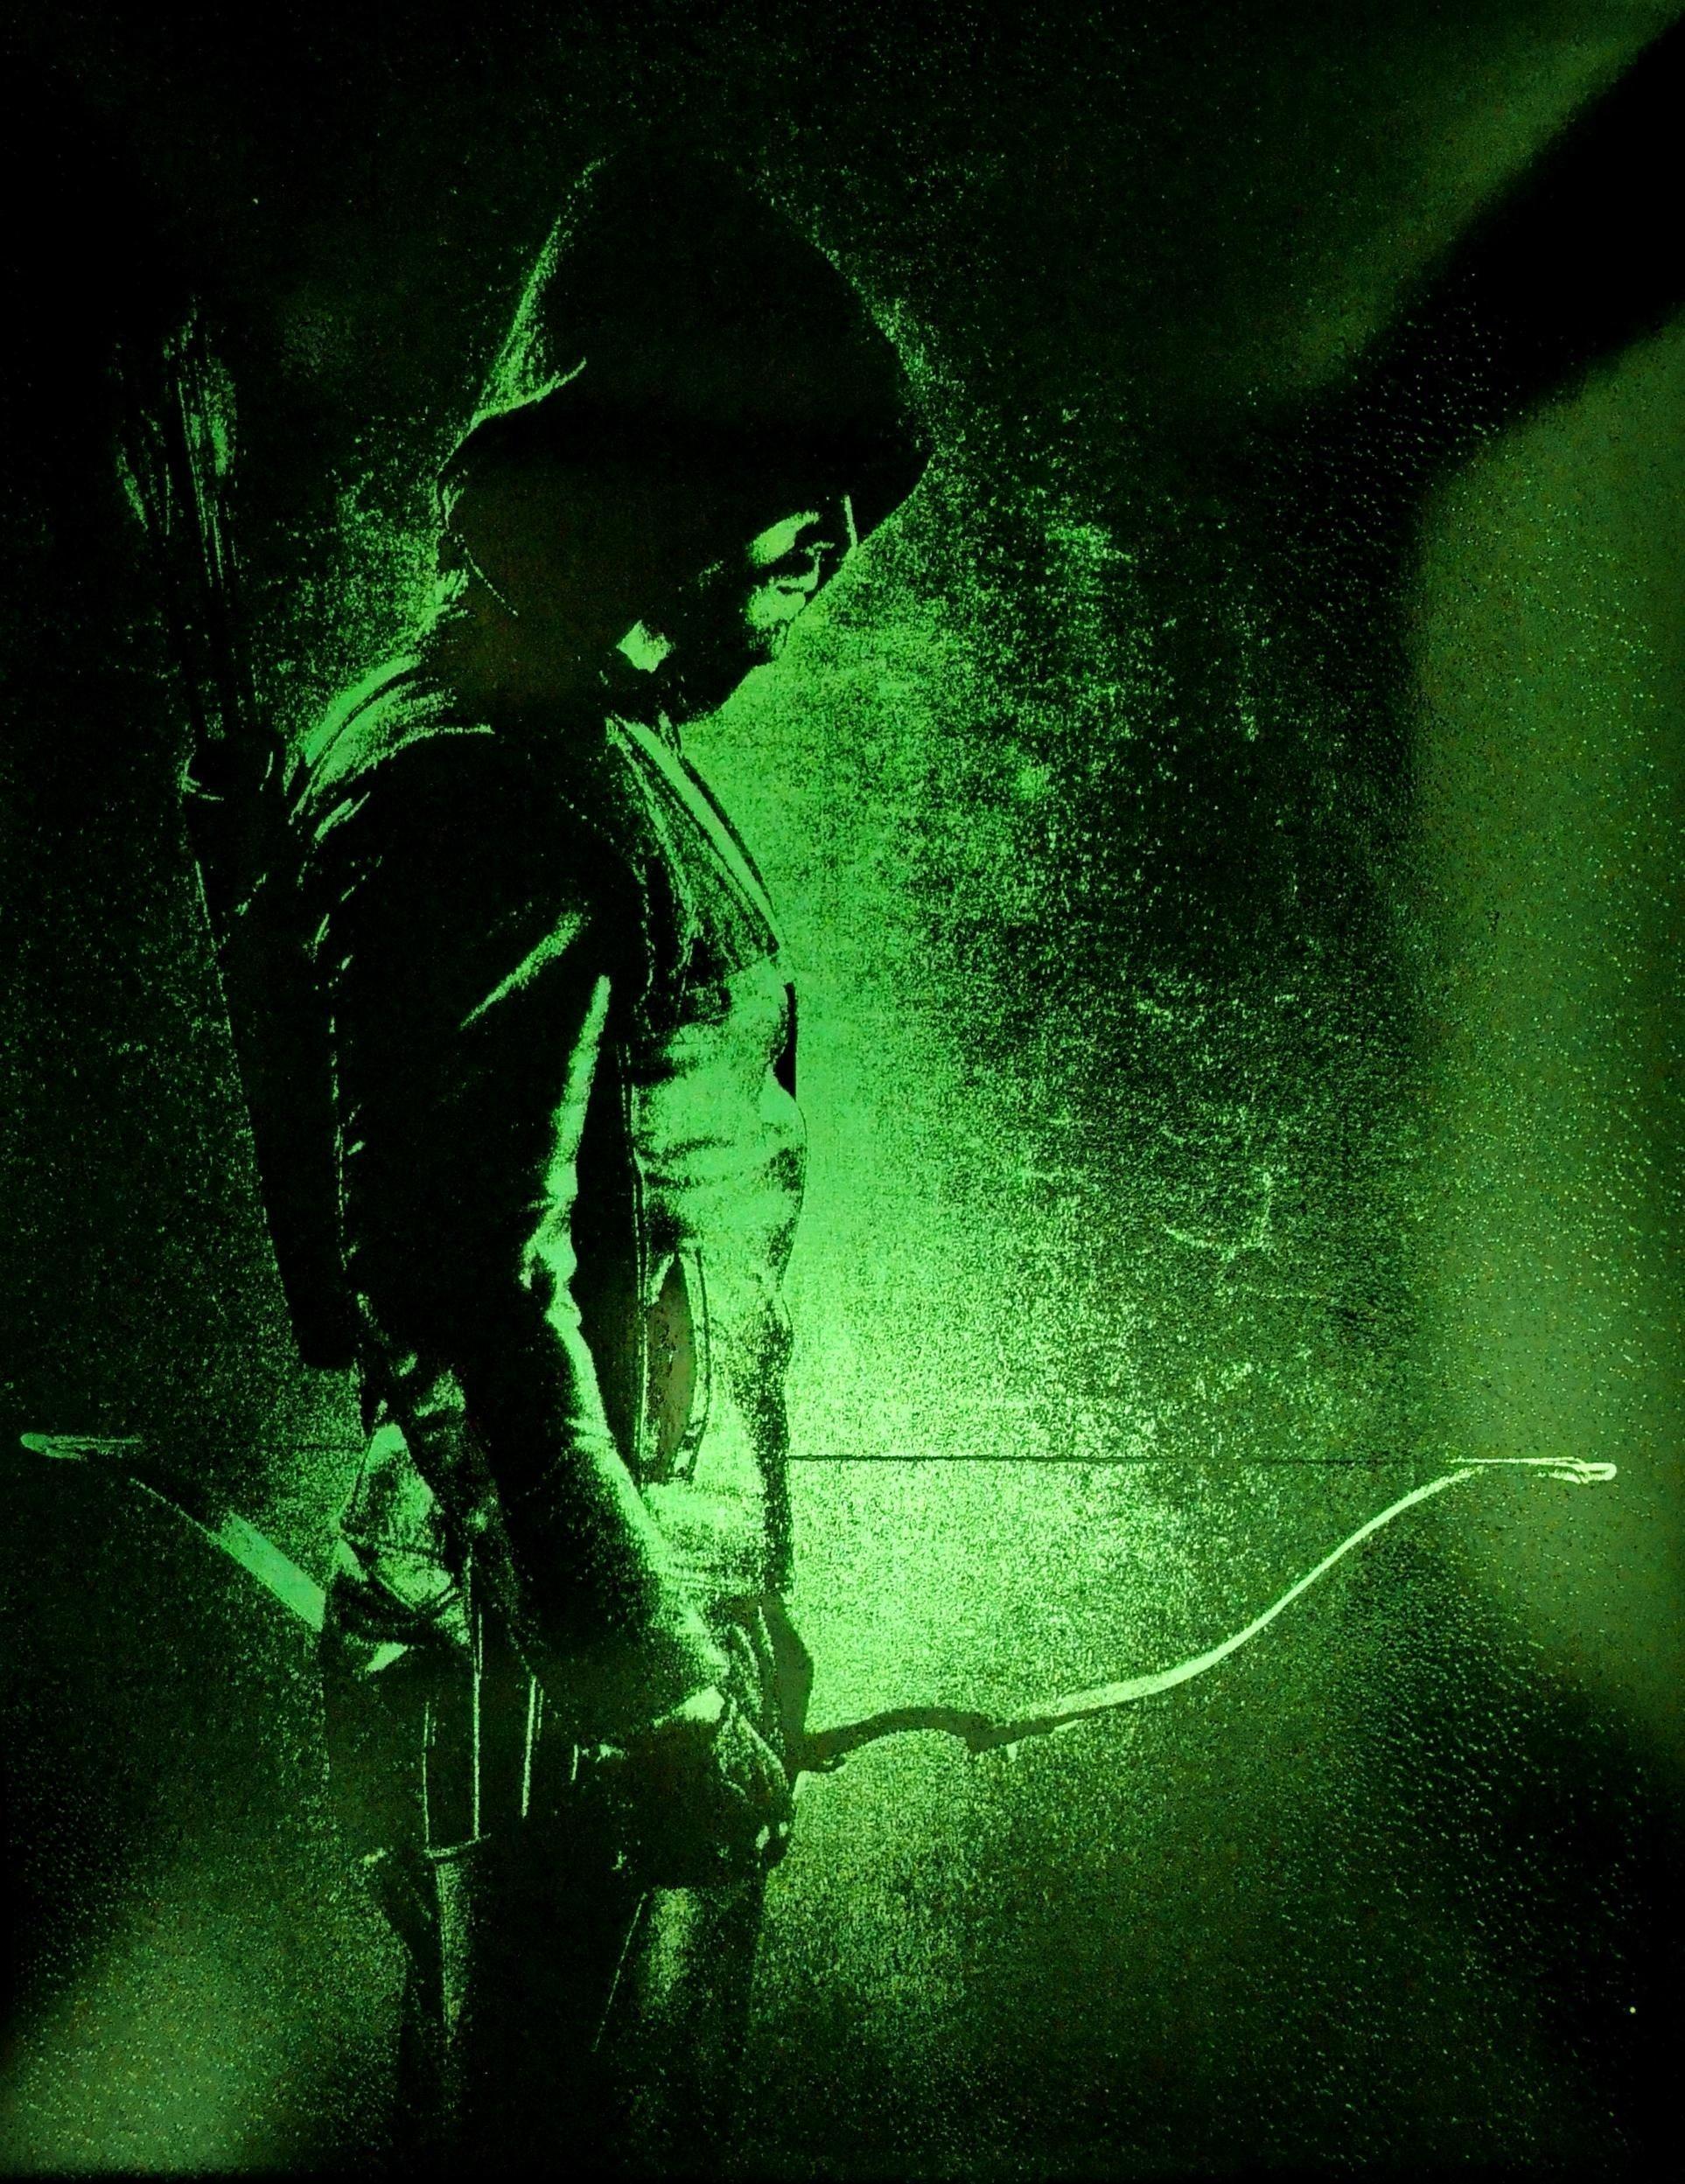 Green Arrow Metal Painting Arrowverse CW DC Comics Justice League Spray Paint Art by Art of Steel